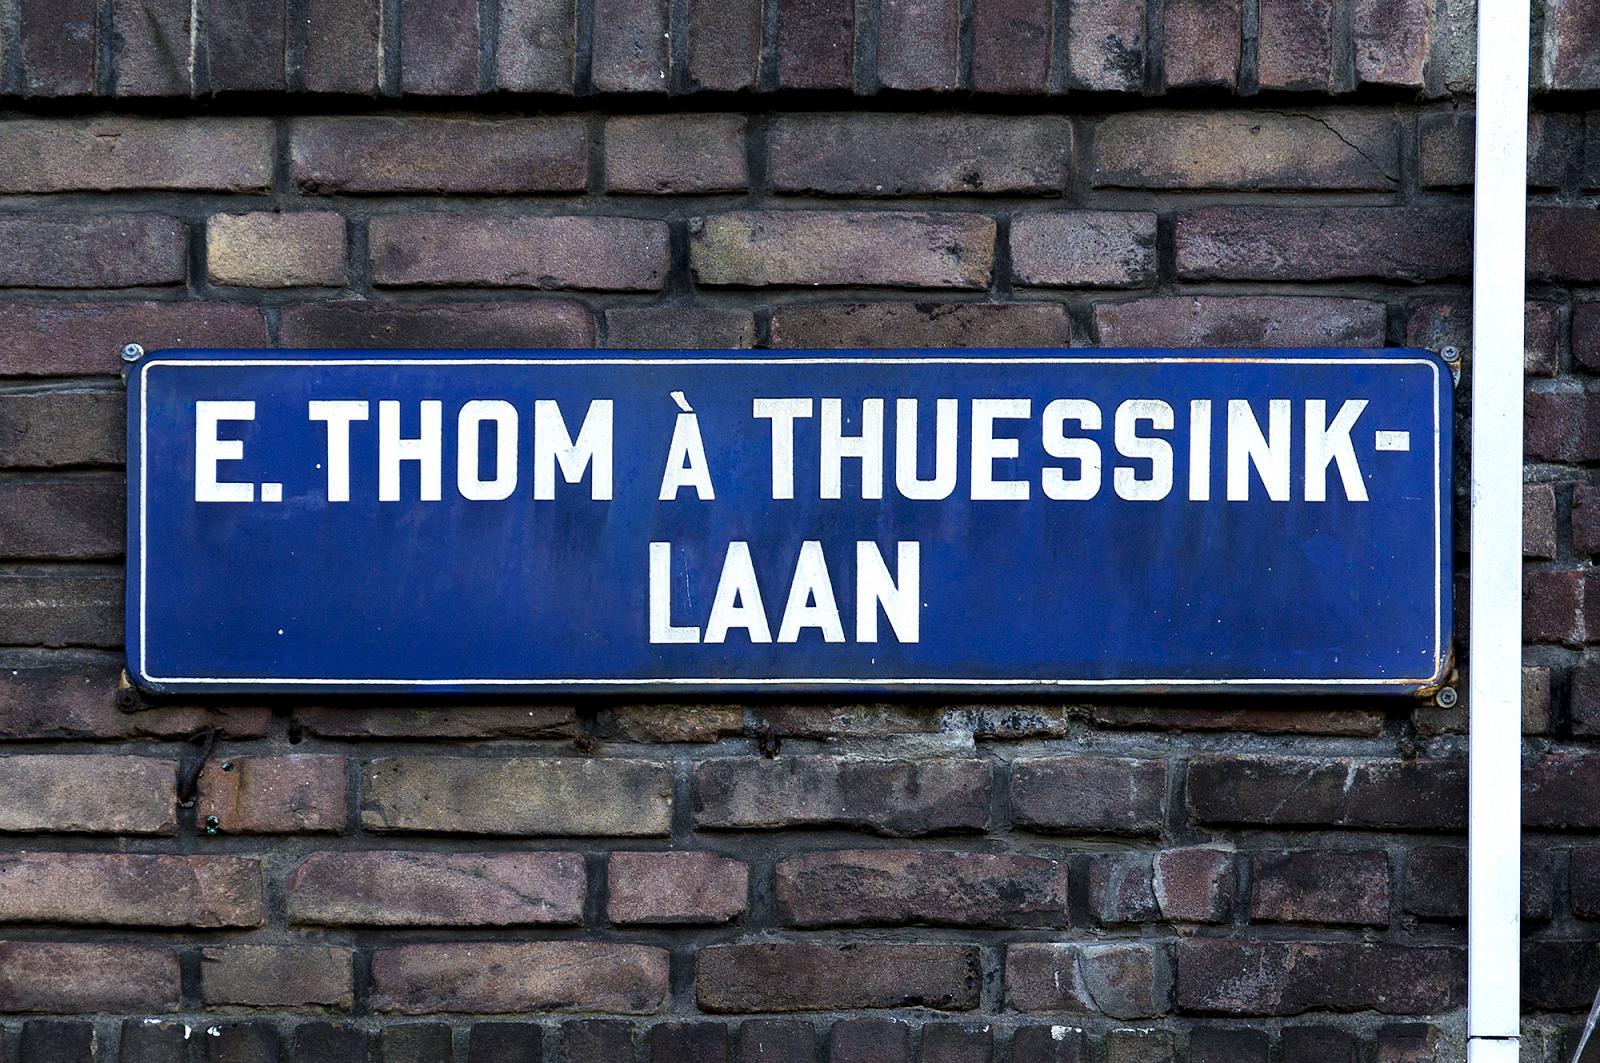 E. Thom à Thuessinklaan